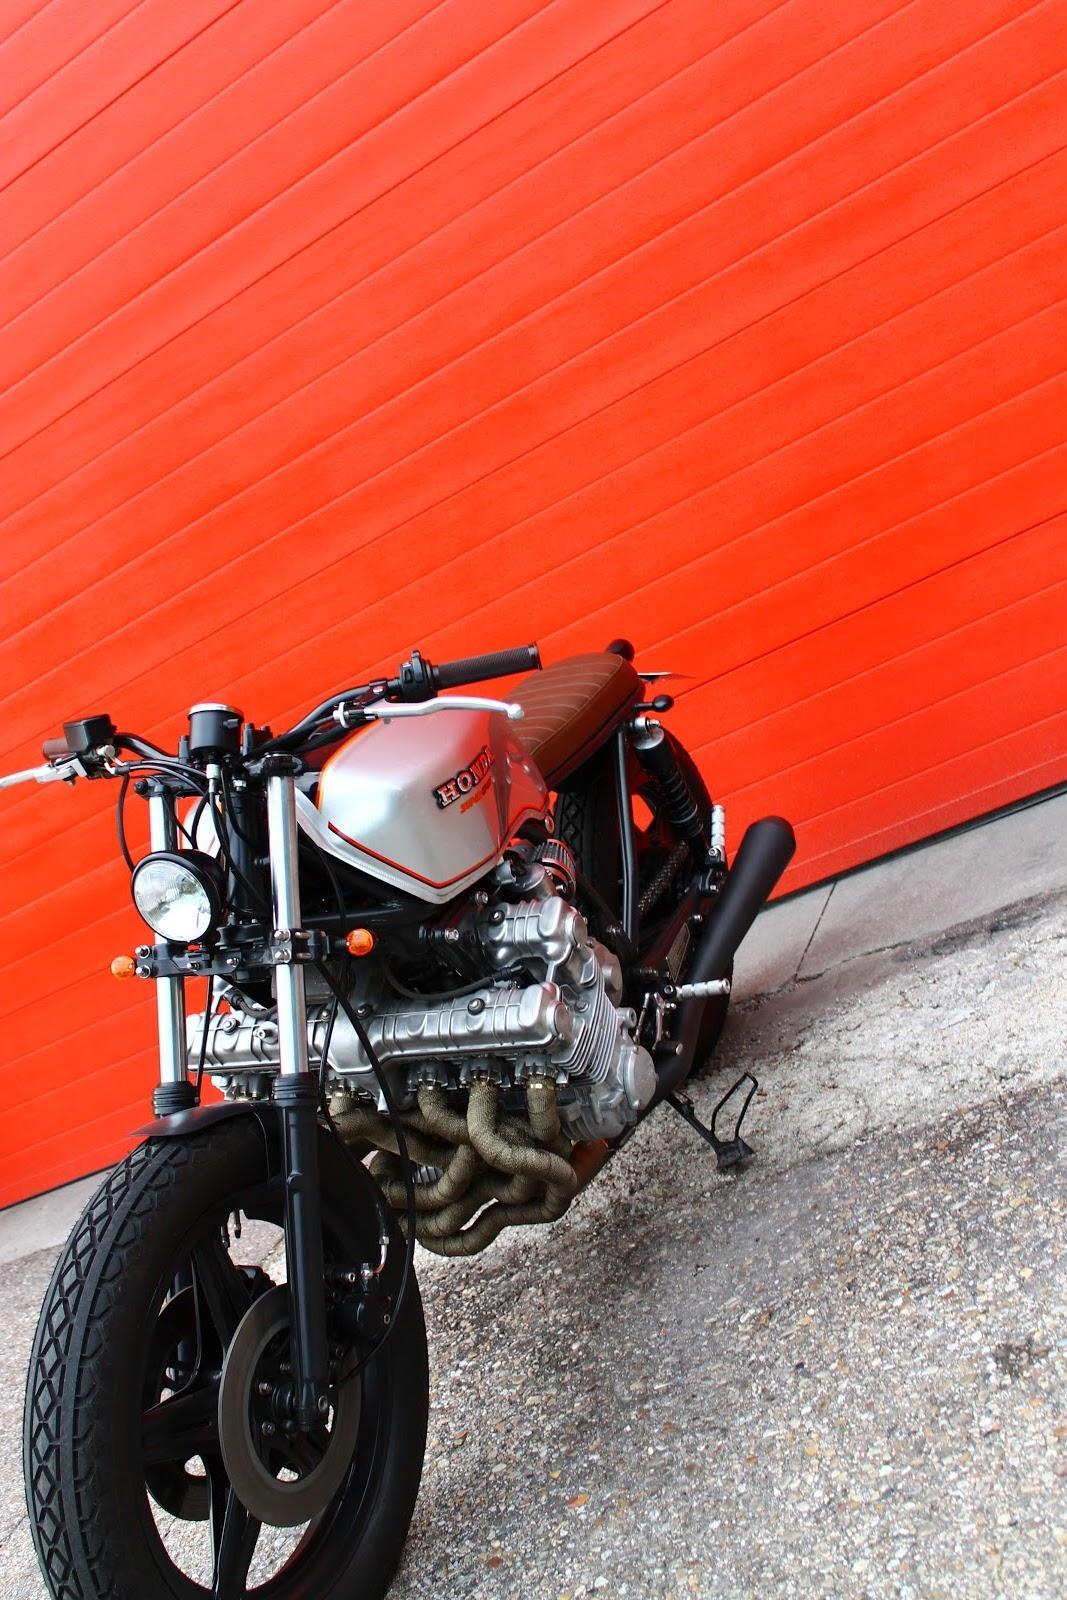 6-Cylinder Honda CBX1000 By Tarmac Custom Motorcycles